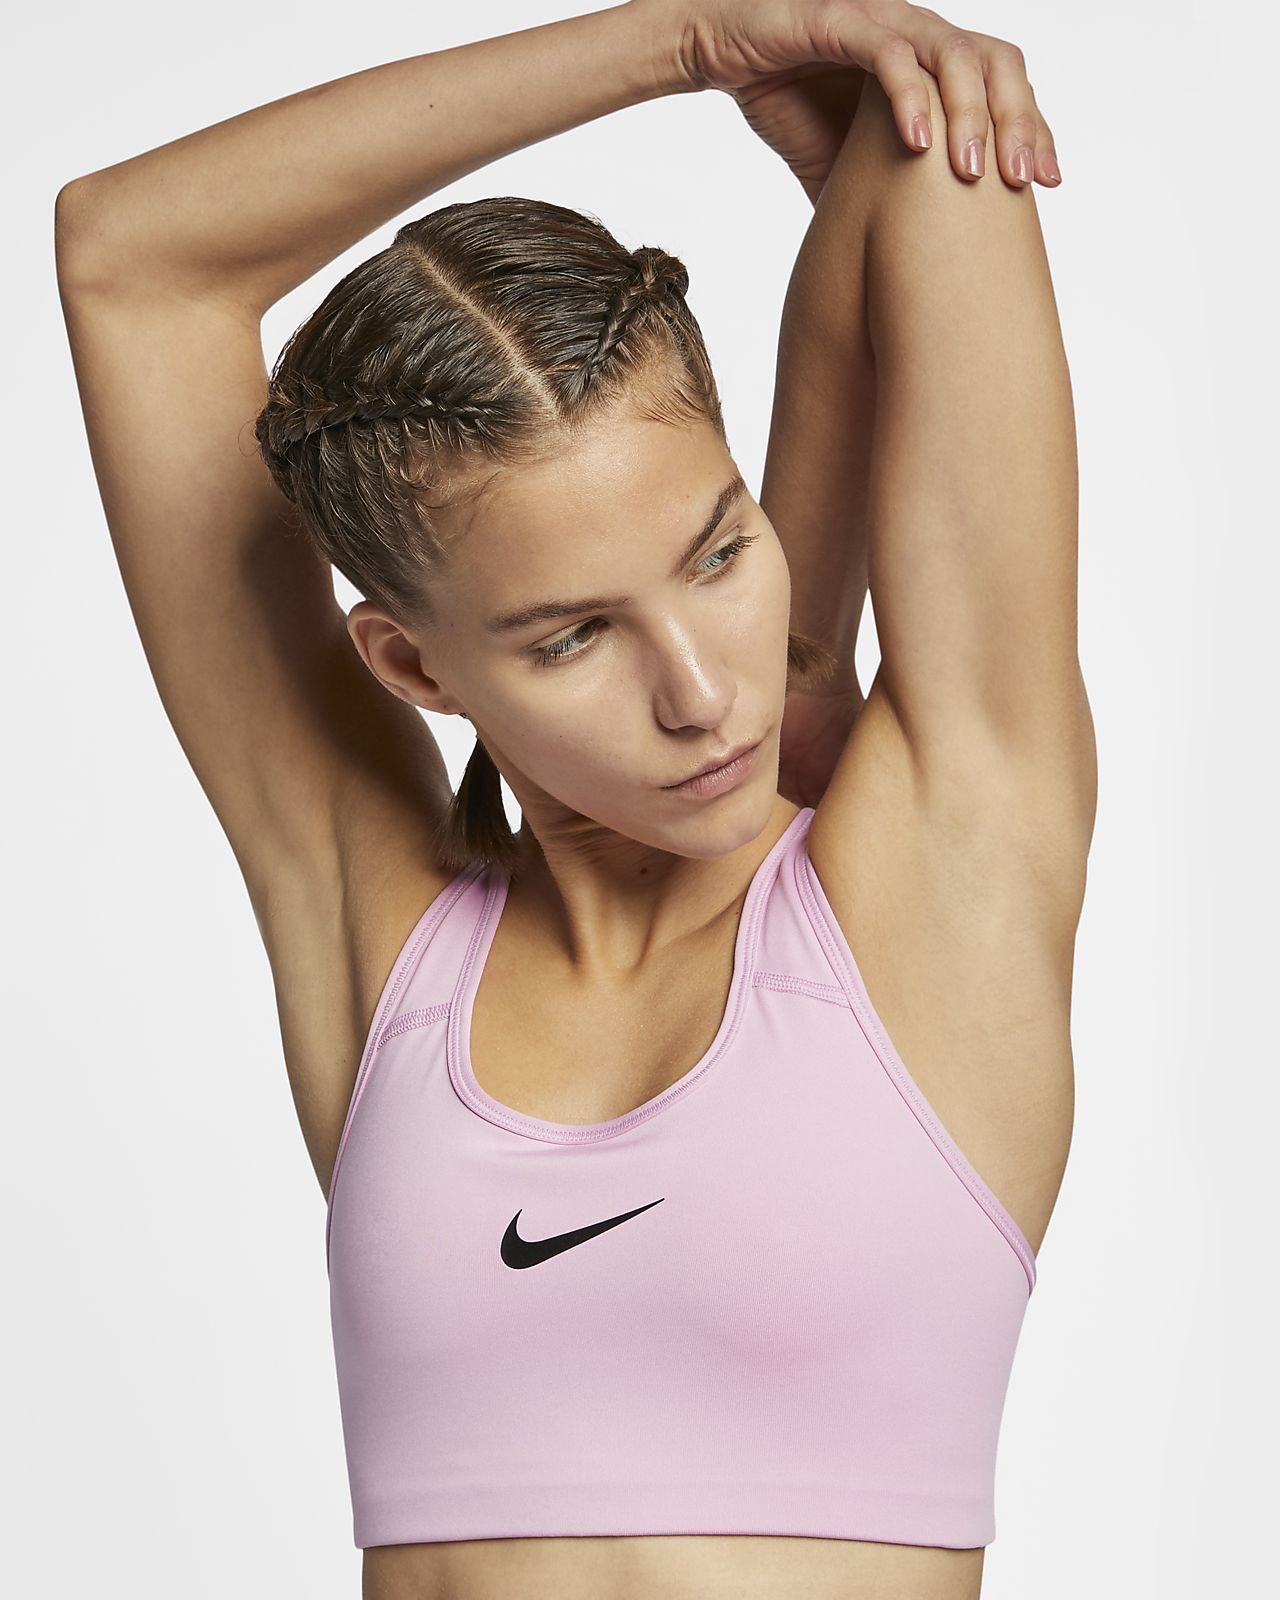 952bd70a93ed0 Nike Women s Swoosh Medium-Support Sports Bra. Nike.com AT